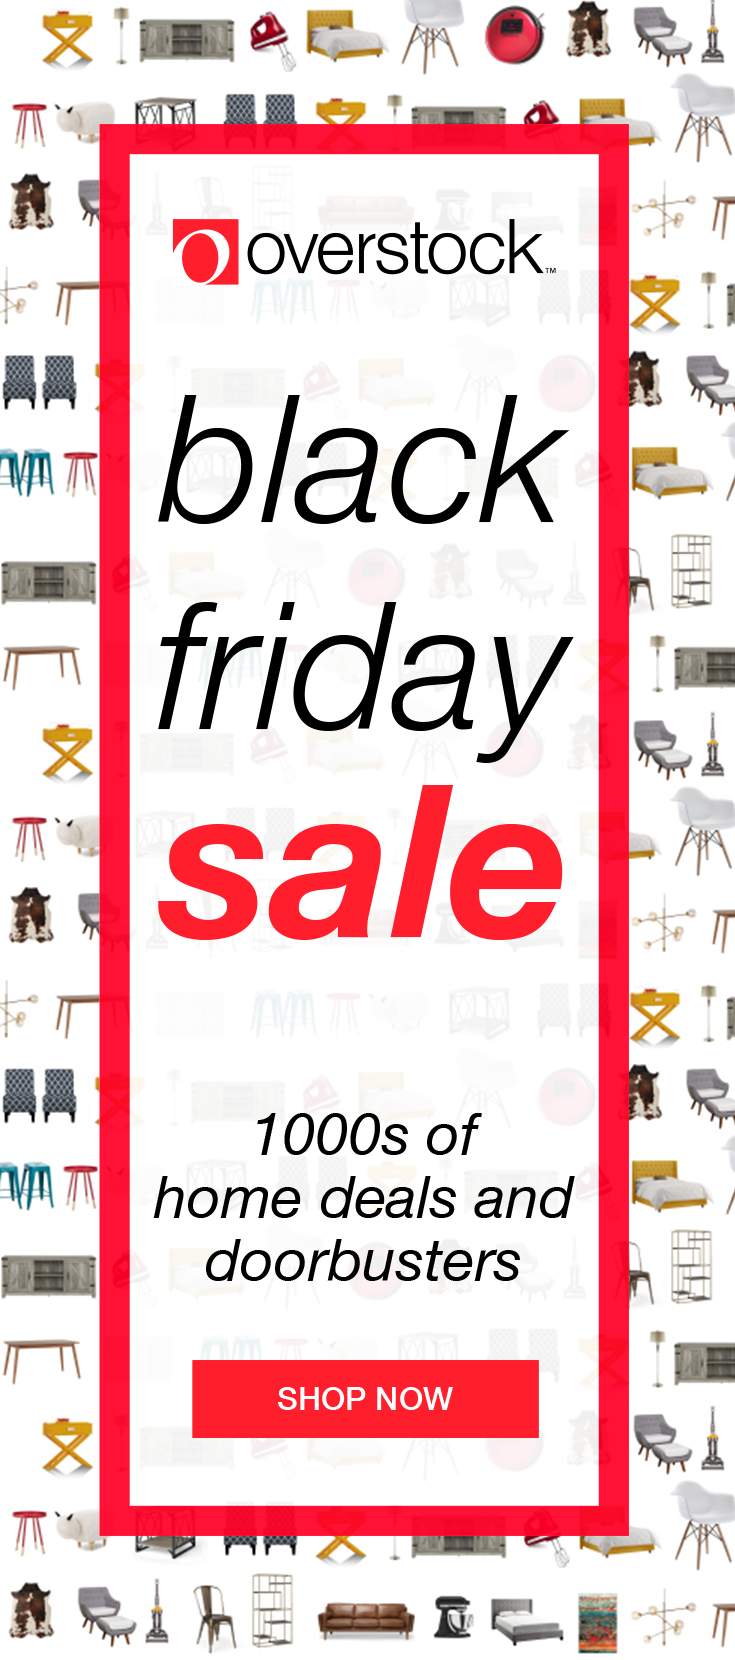 Black Friday Online Deals 2018 - Overstock.com: The Best Black ...